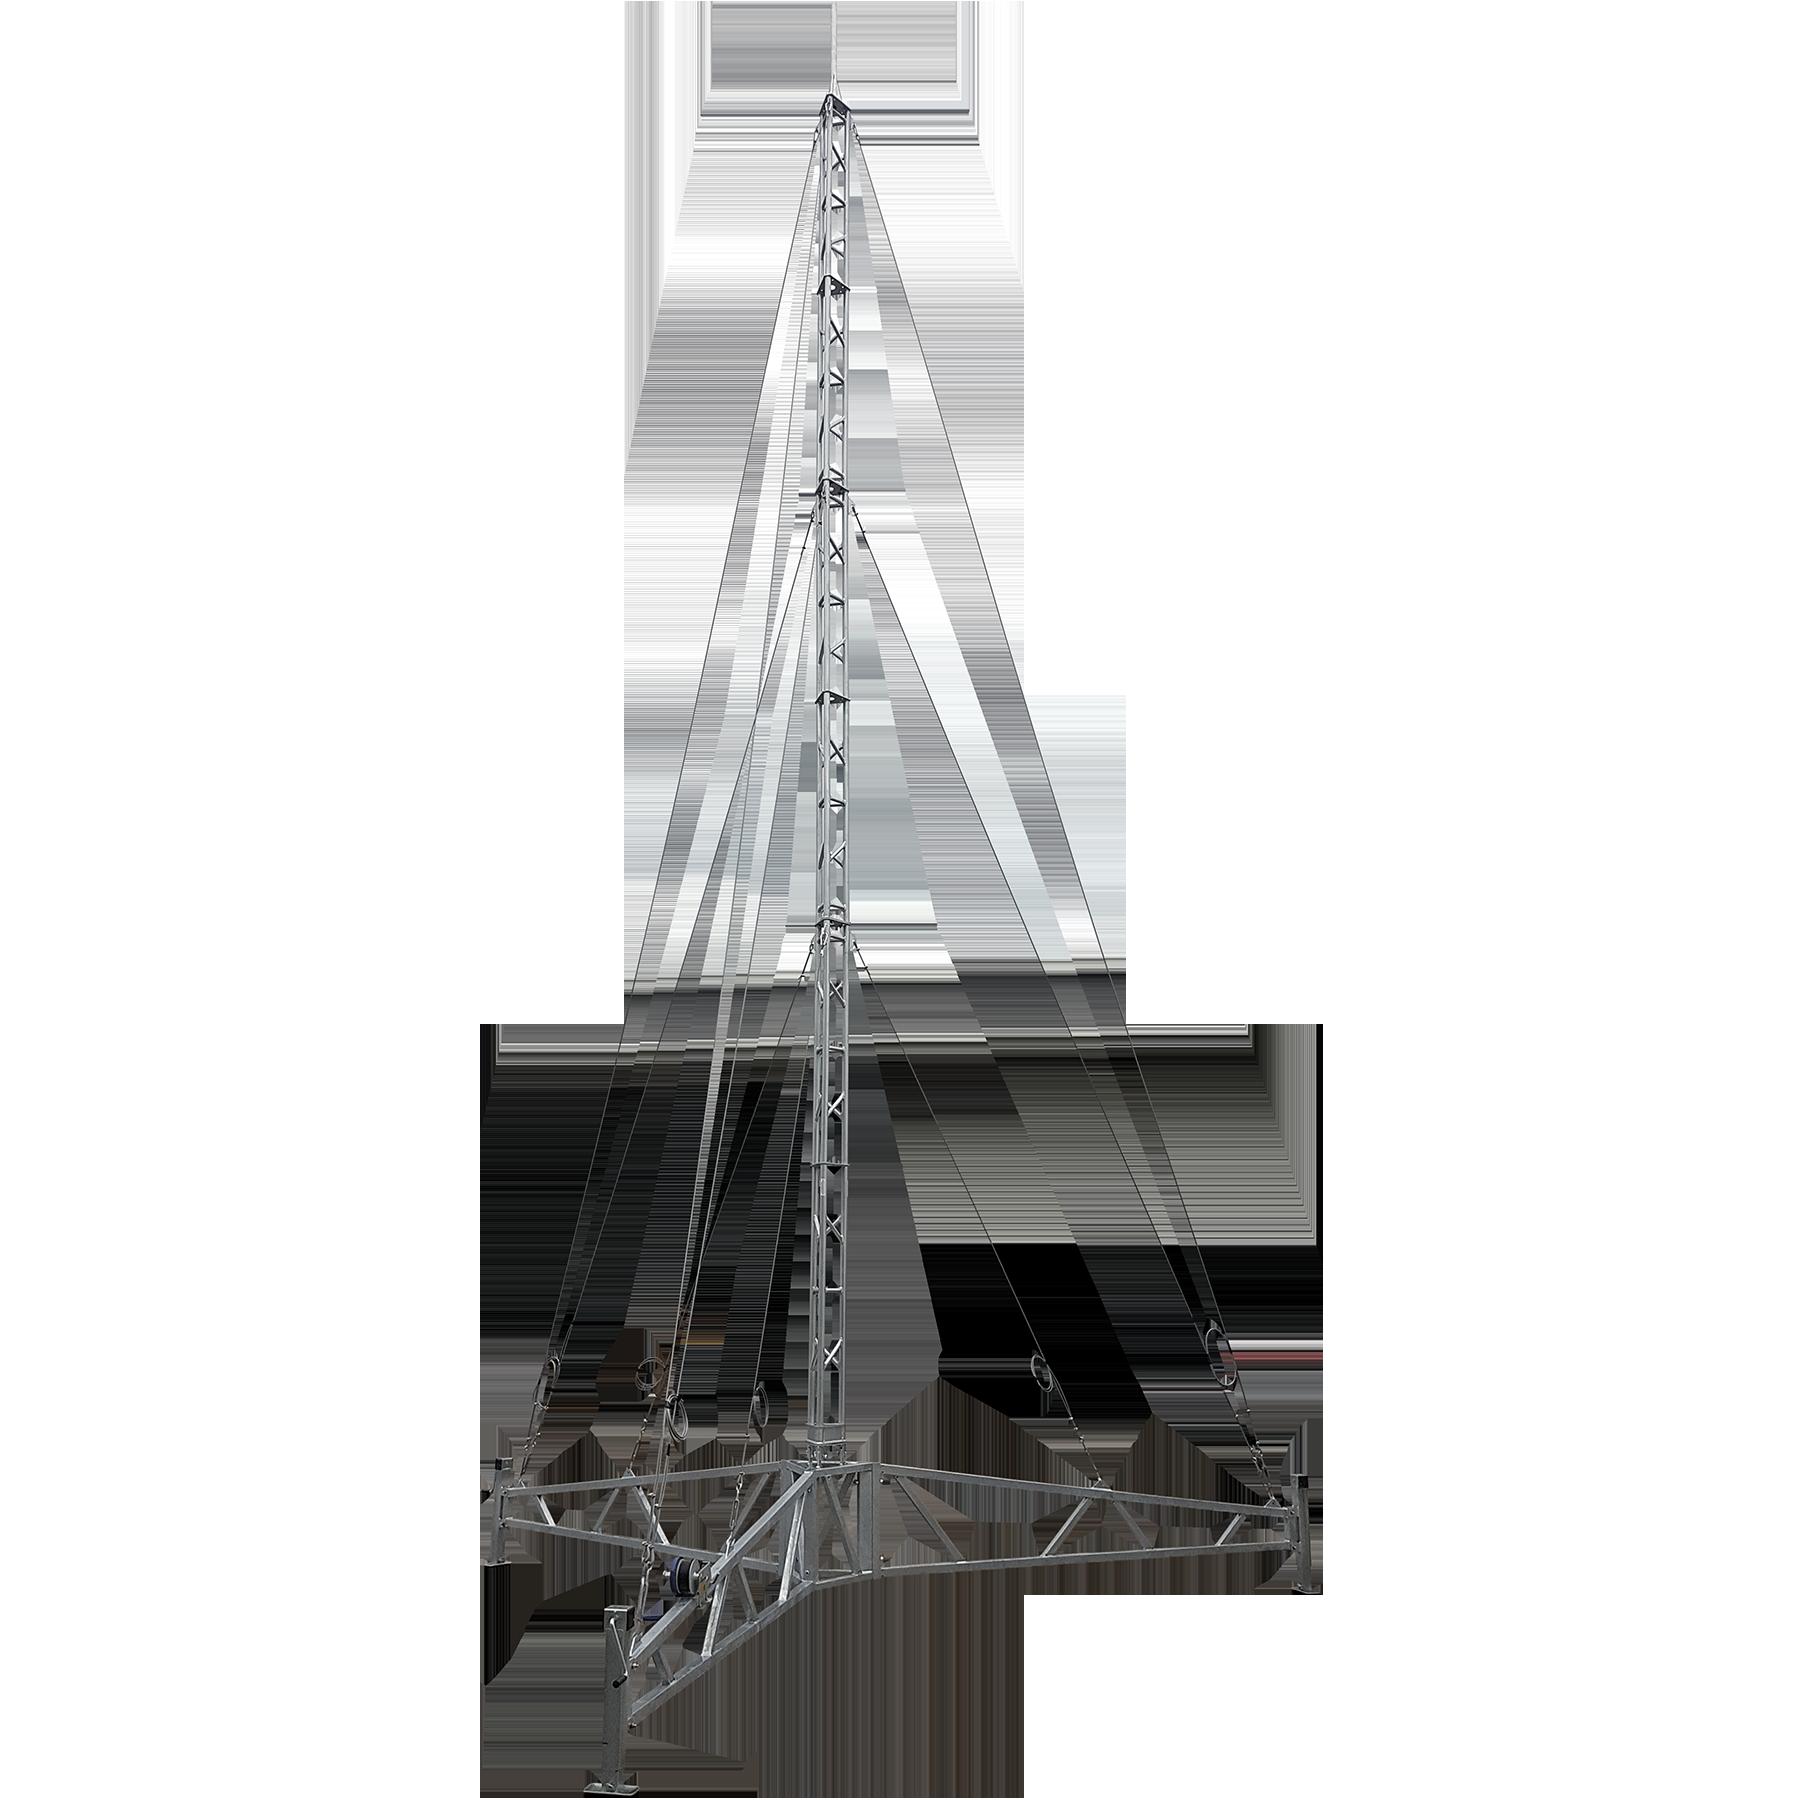 Towers apac portable lattice. Crane clipart small tower